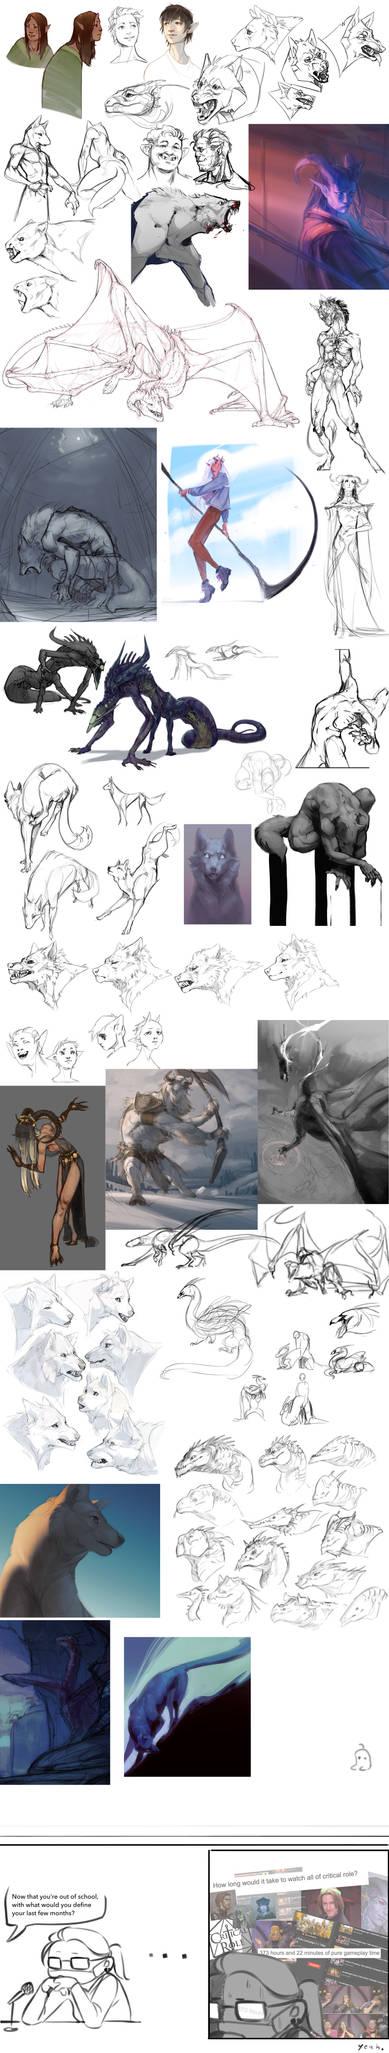 Sketchdump.18 oboy